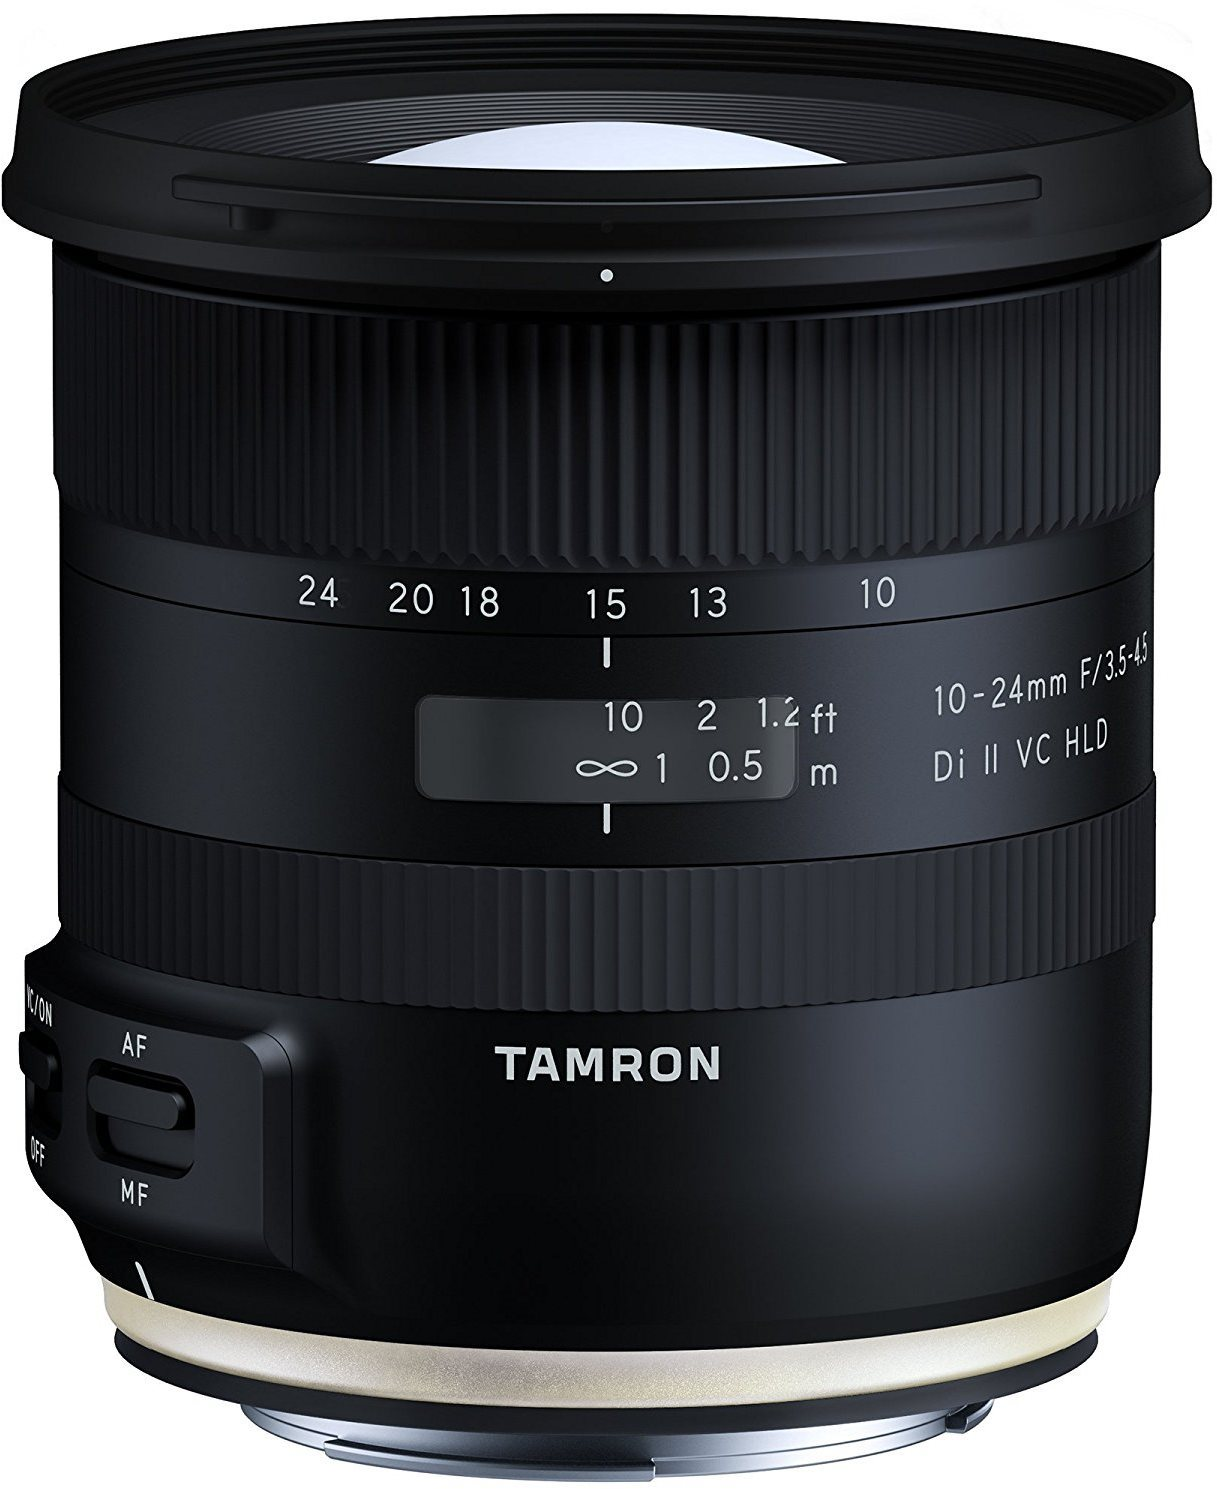 Tamron SP 10-24mm F/3.5-4.5 Di II VC HLD (Canon)